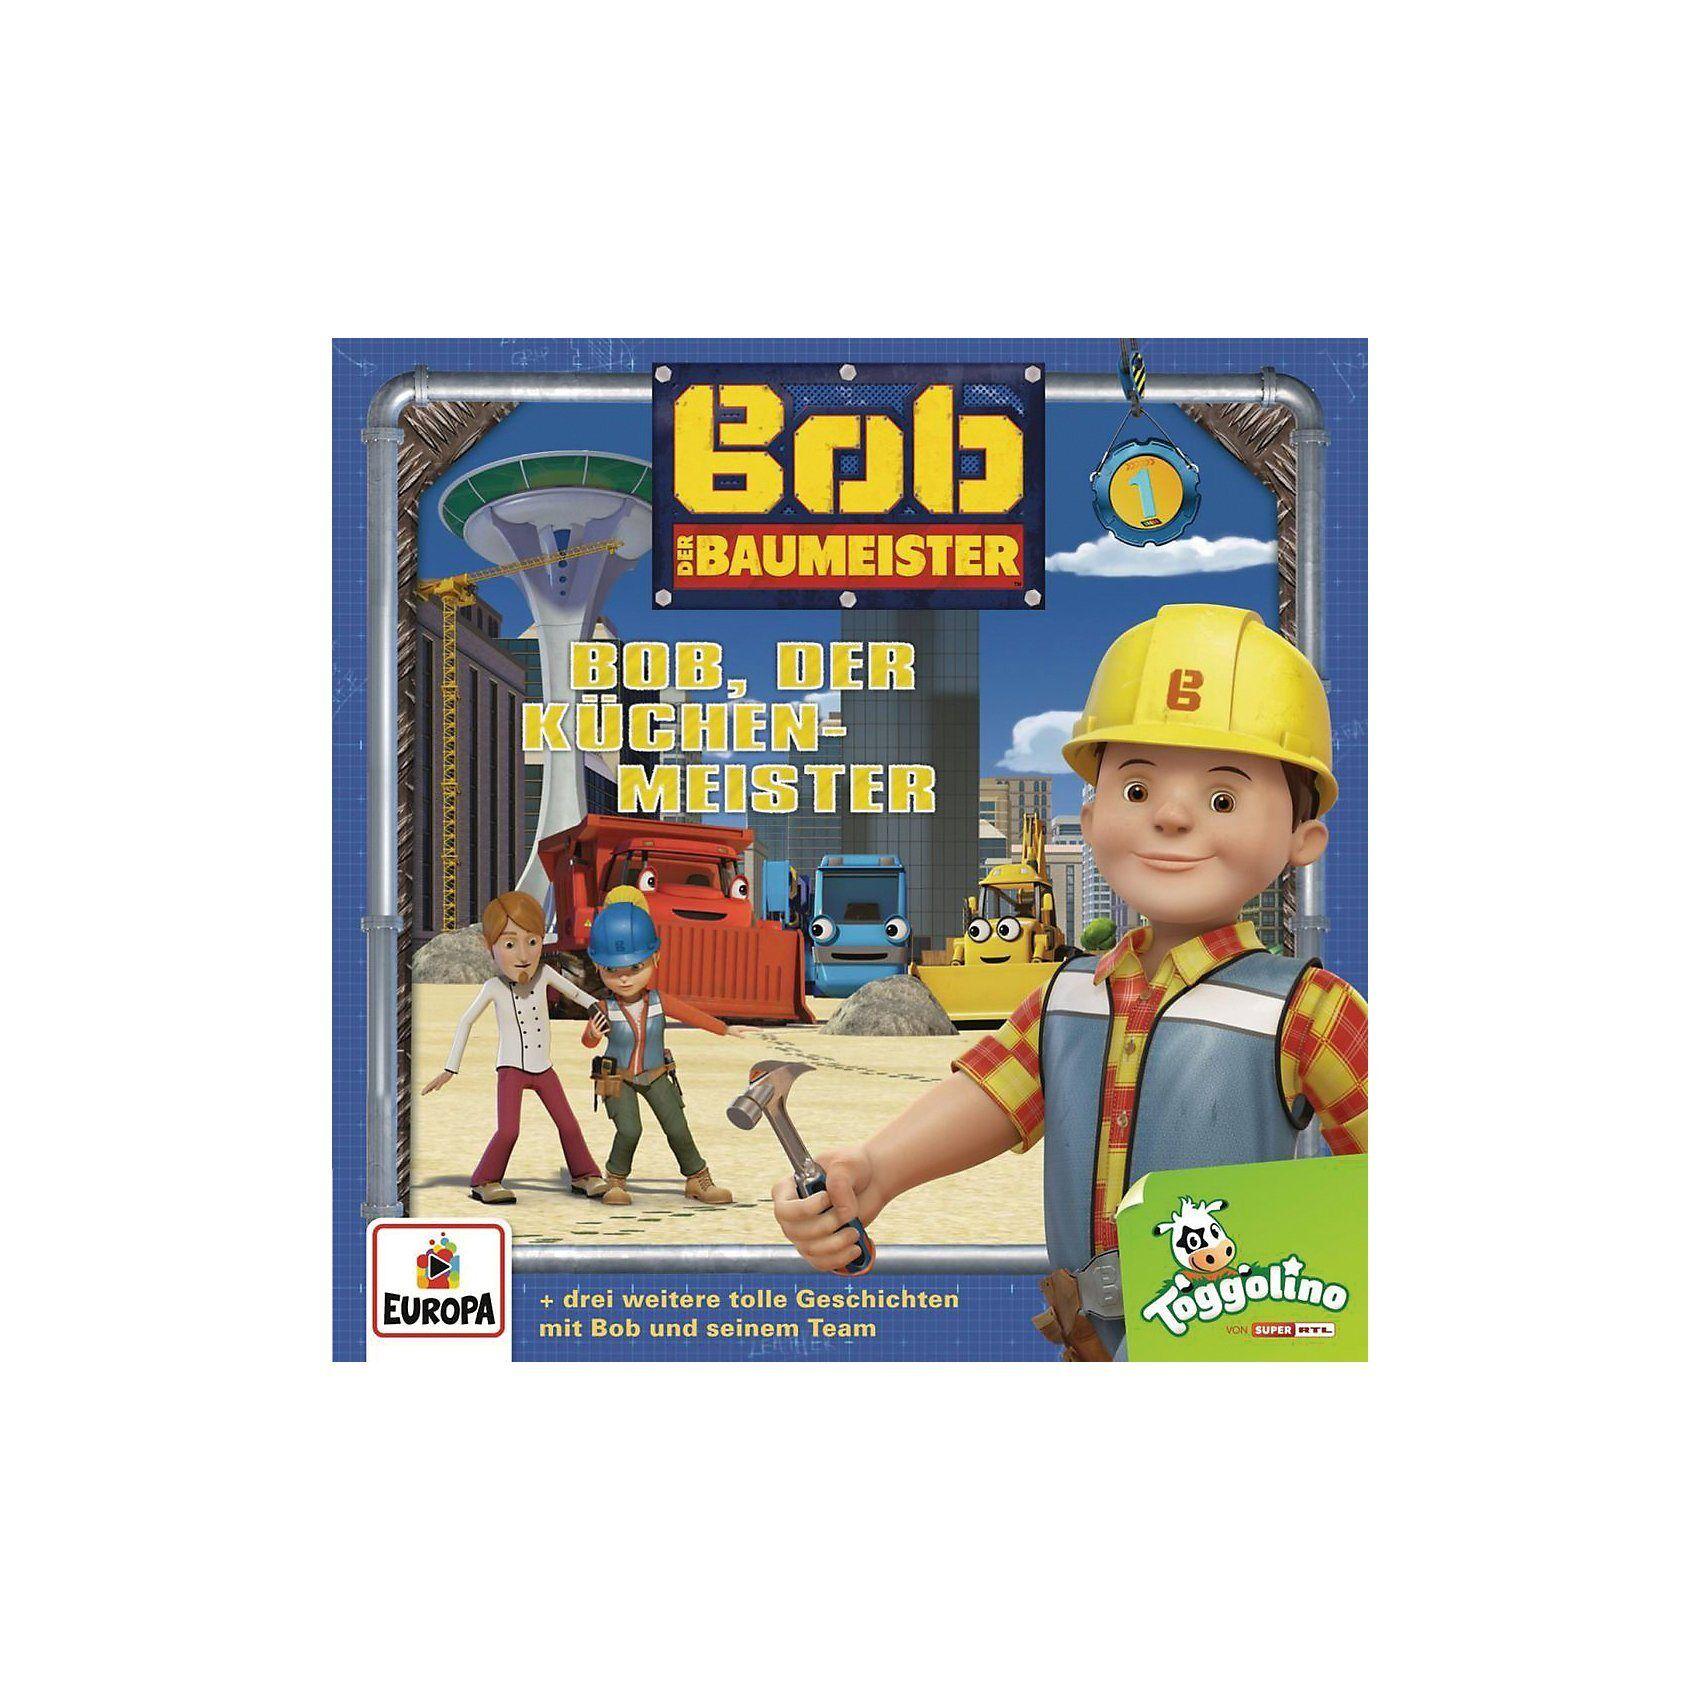 Sony CD Bob der Baumeister Relaunch 1